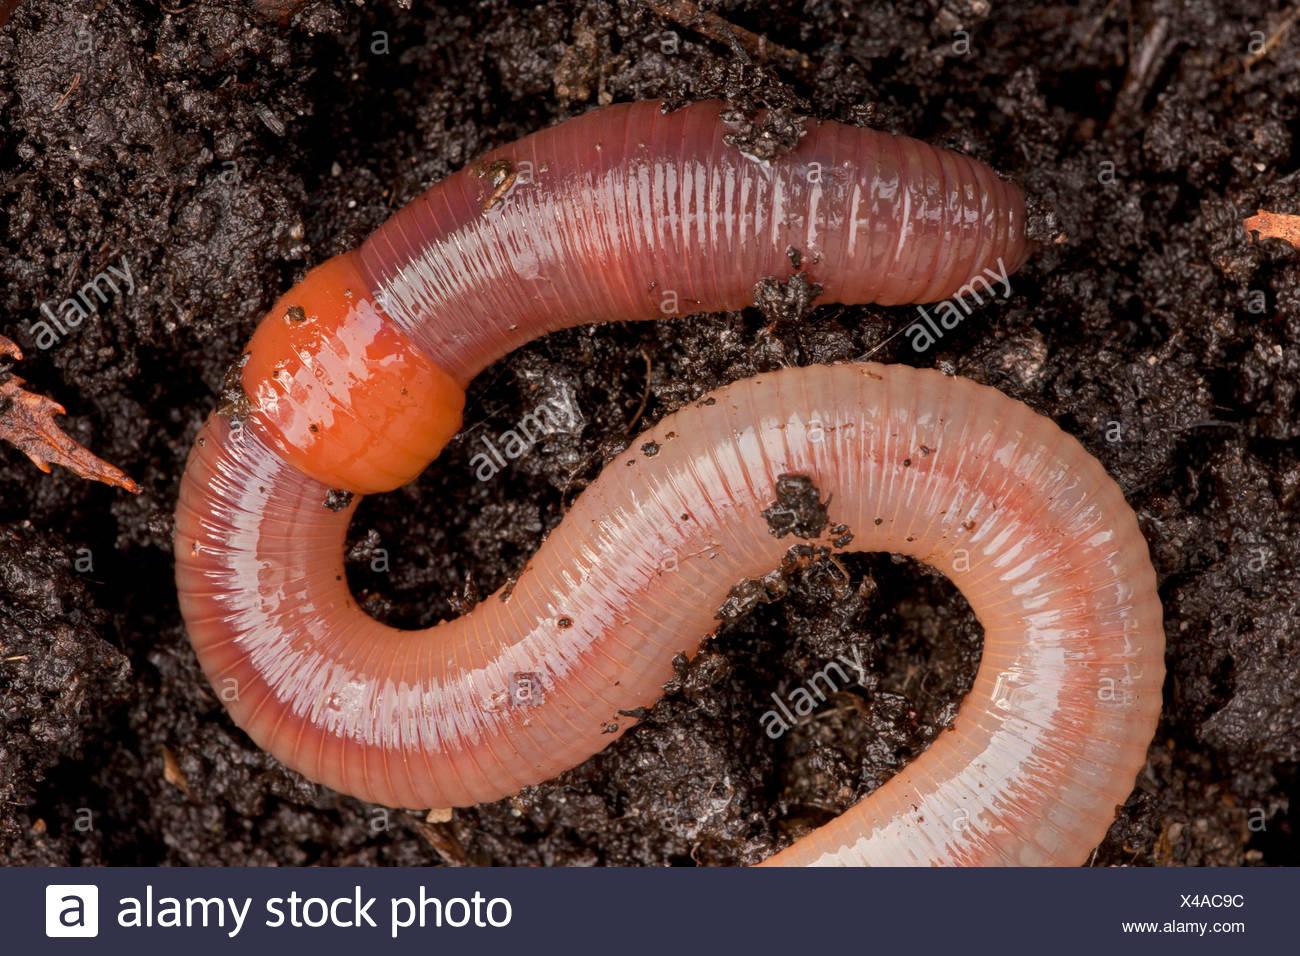 common earthworm earthworm lob worm dew worm squirreltail worm